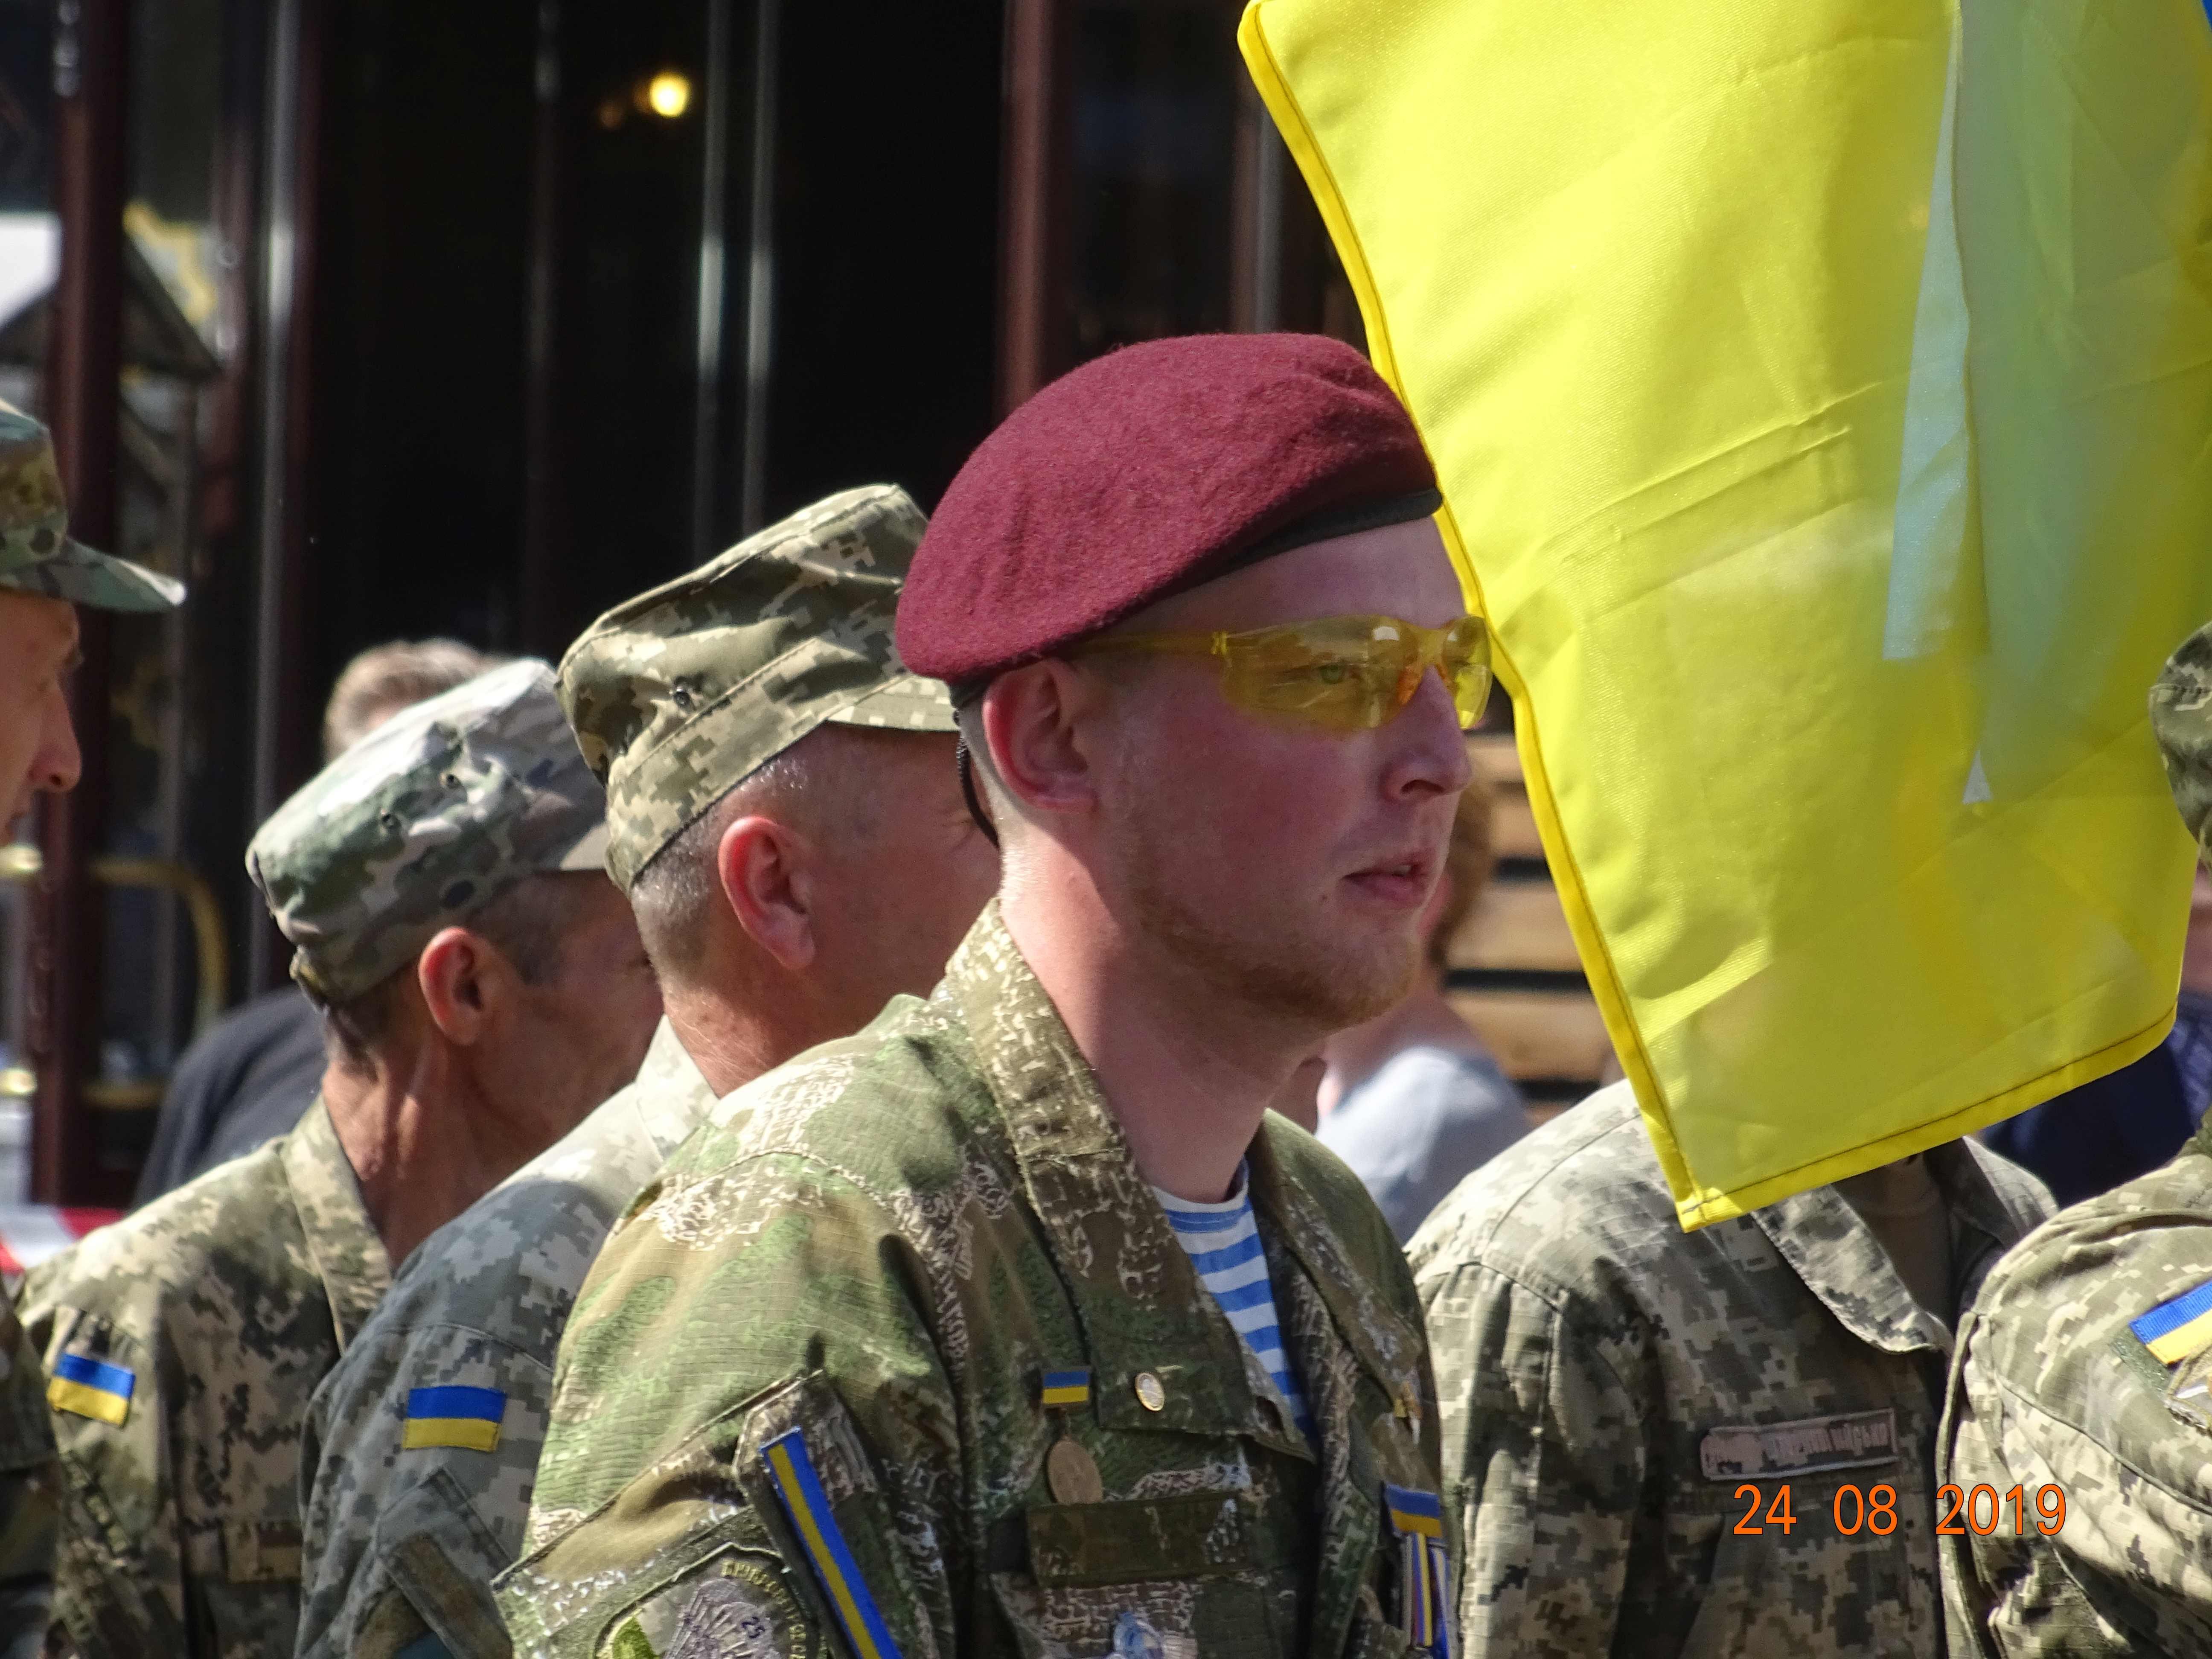 Defenders-of-Ukraine-Parad-24.Aug.19 - DSC06326.jpg